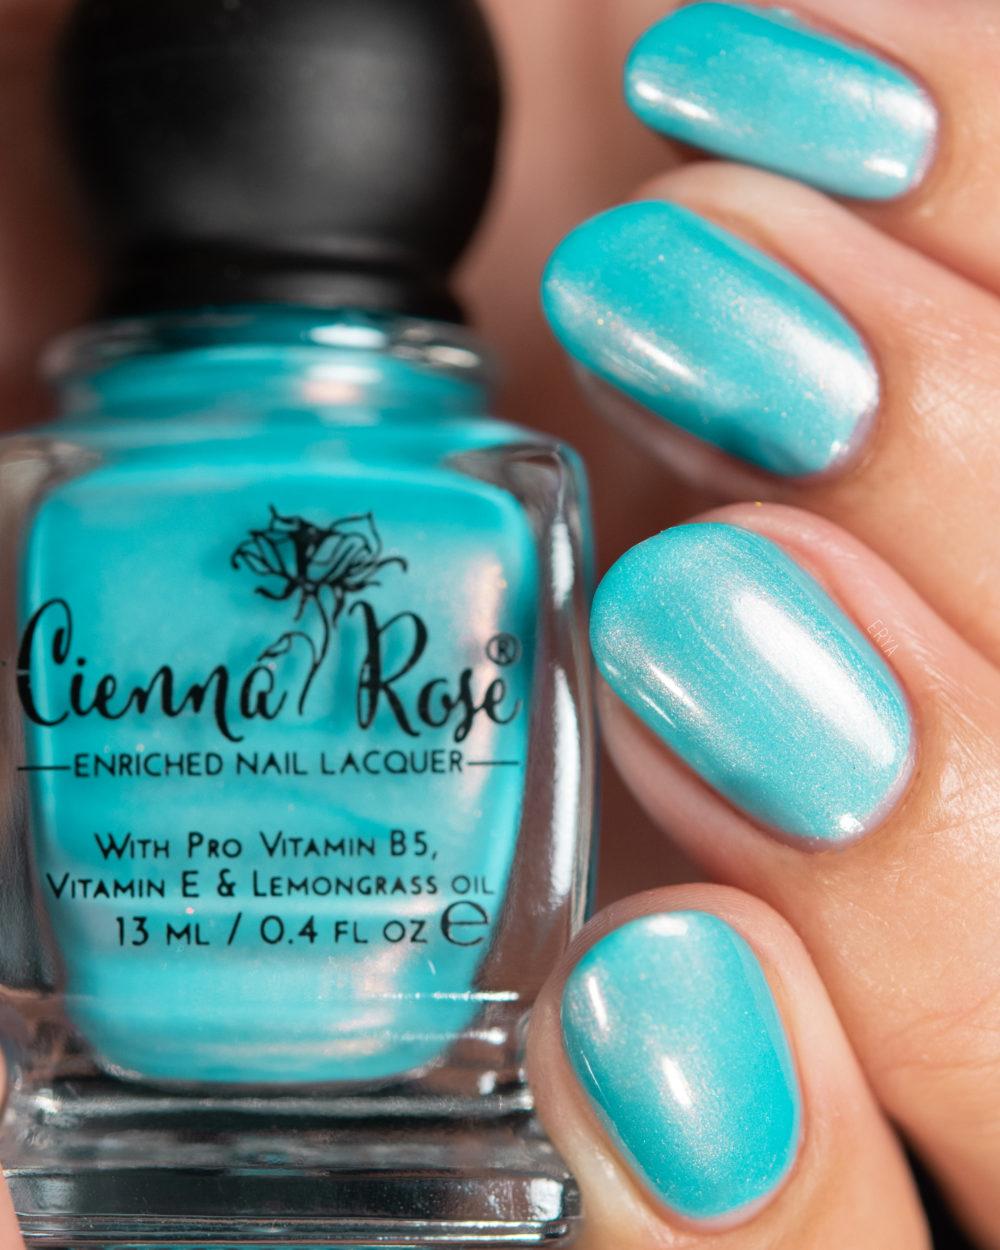 Cienna_Rose-Crush_On_Blue-2